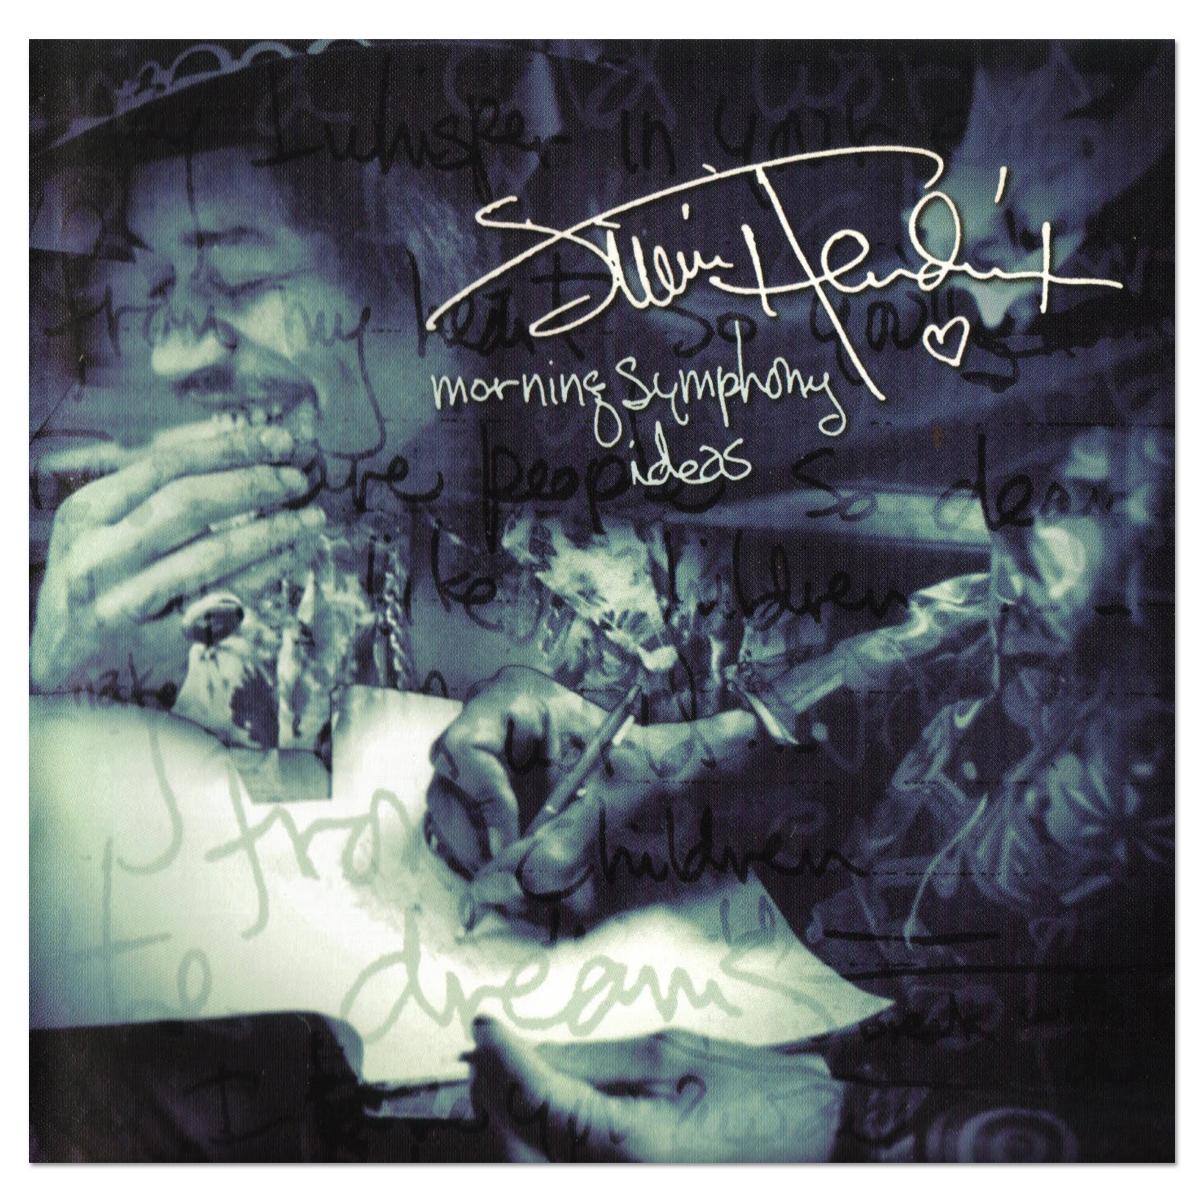 Jimi Hendrix: Morning Symphony Ideas CD